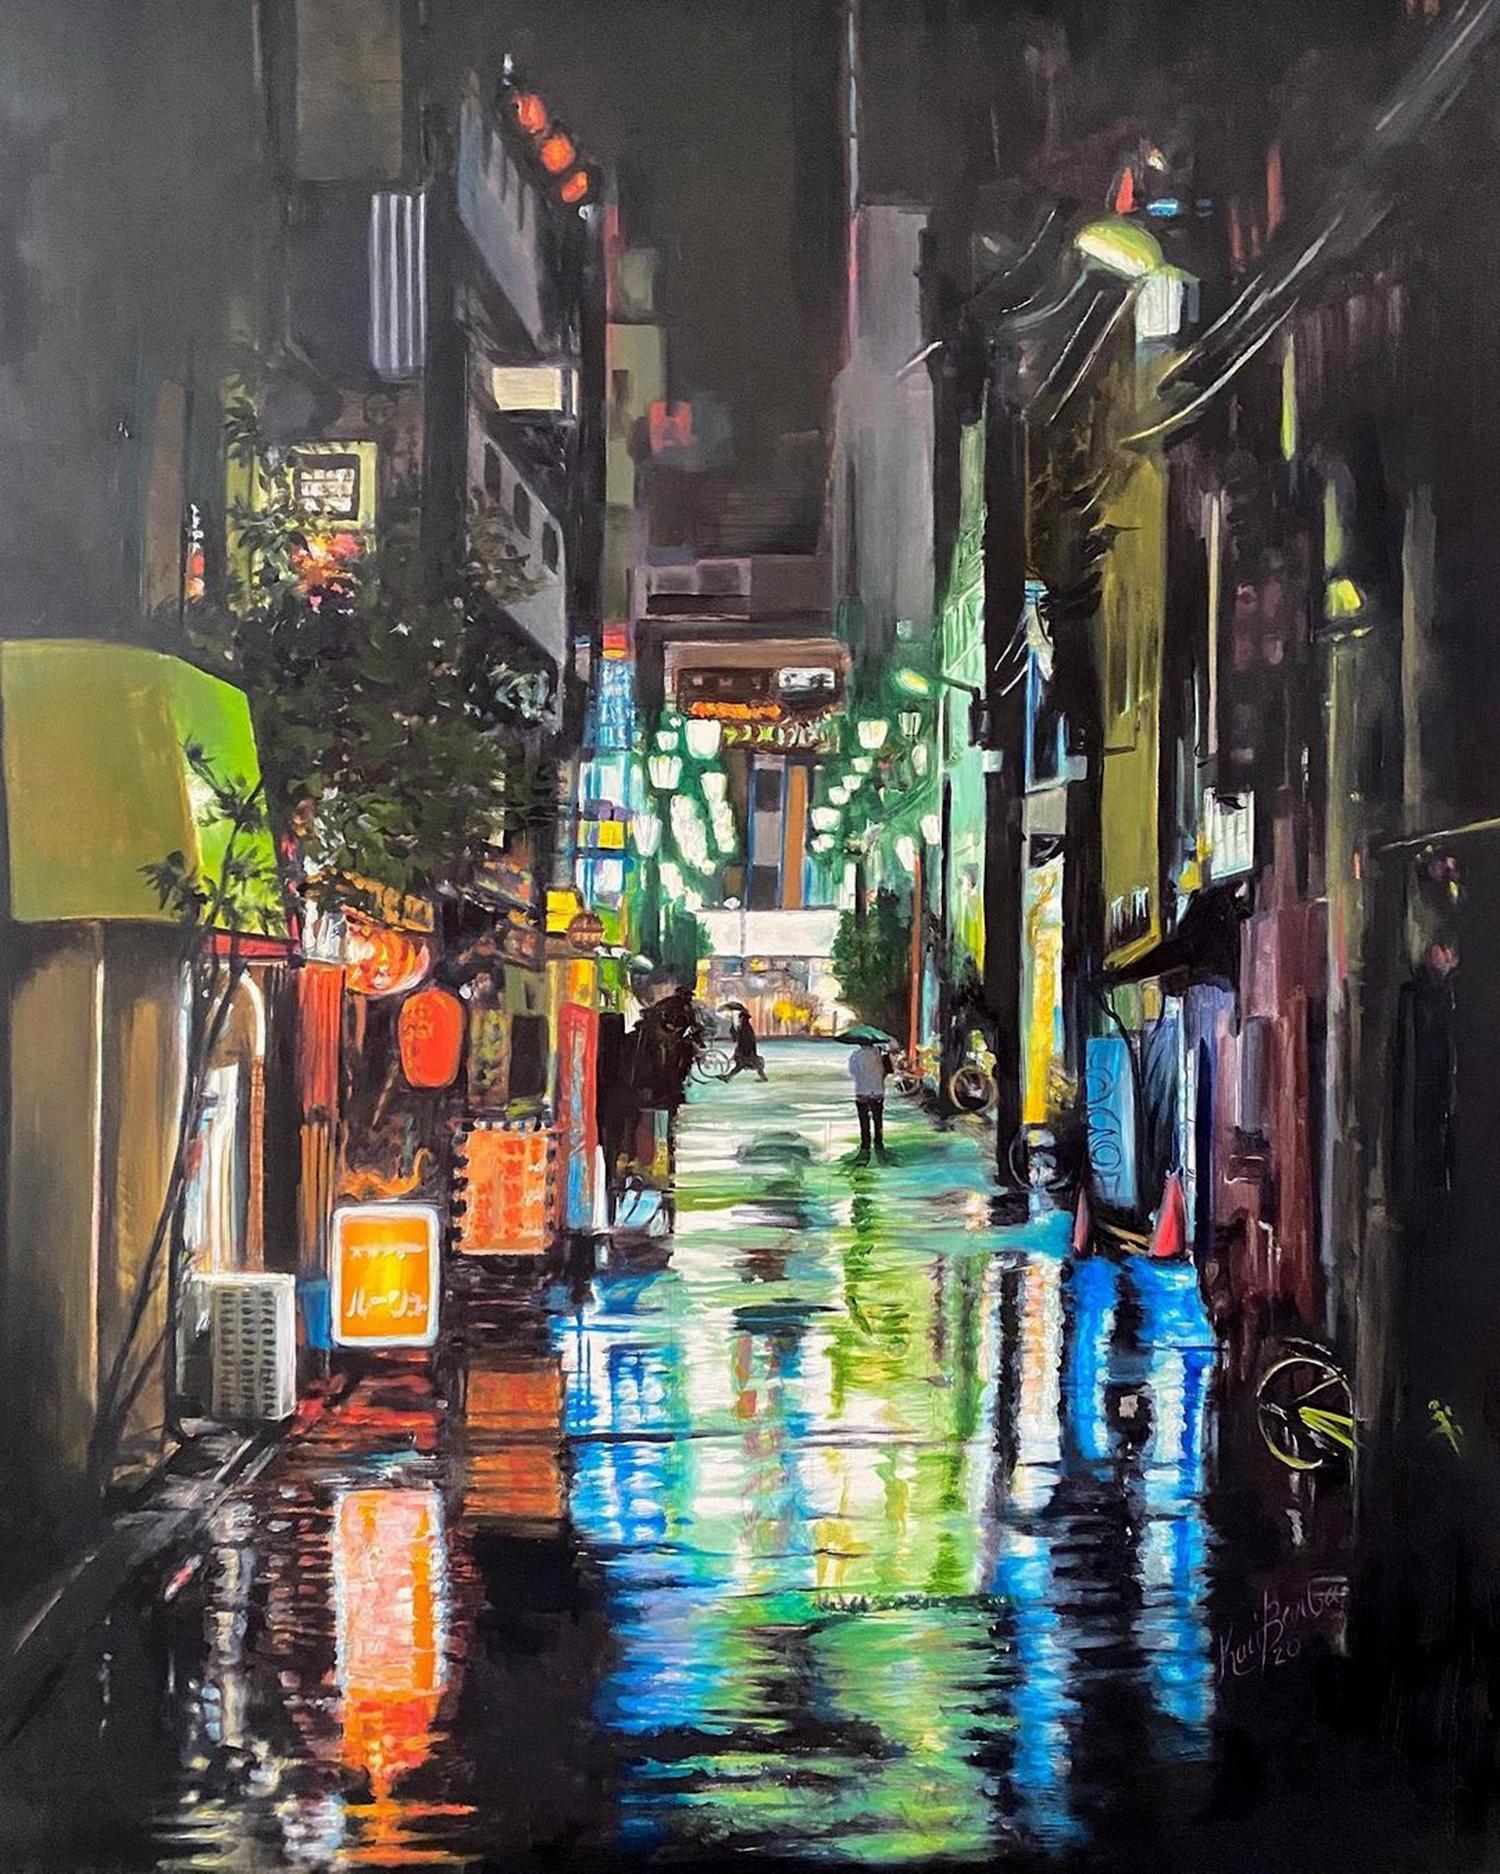 Painting of city street by kari barba